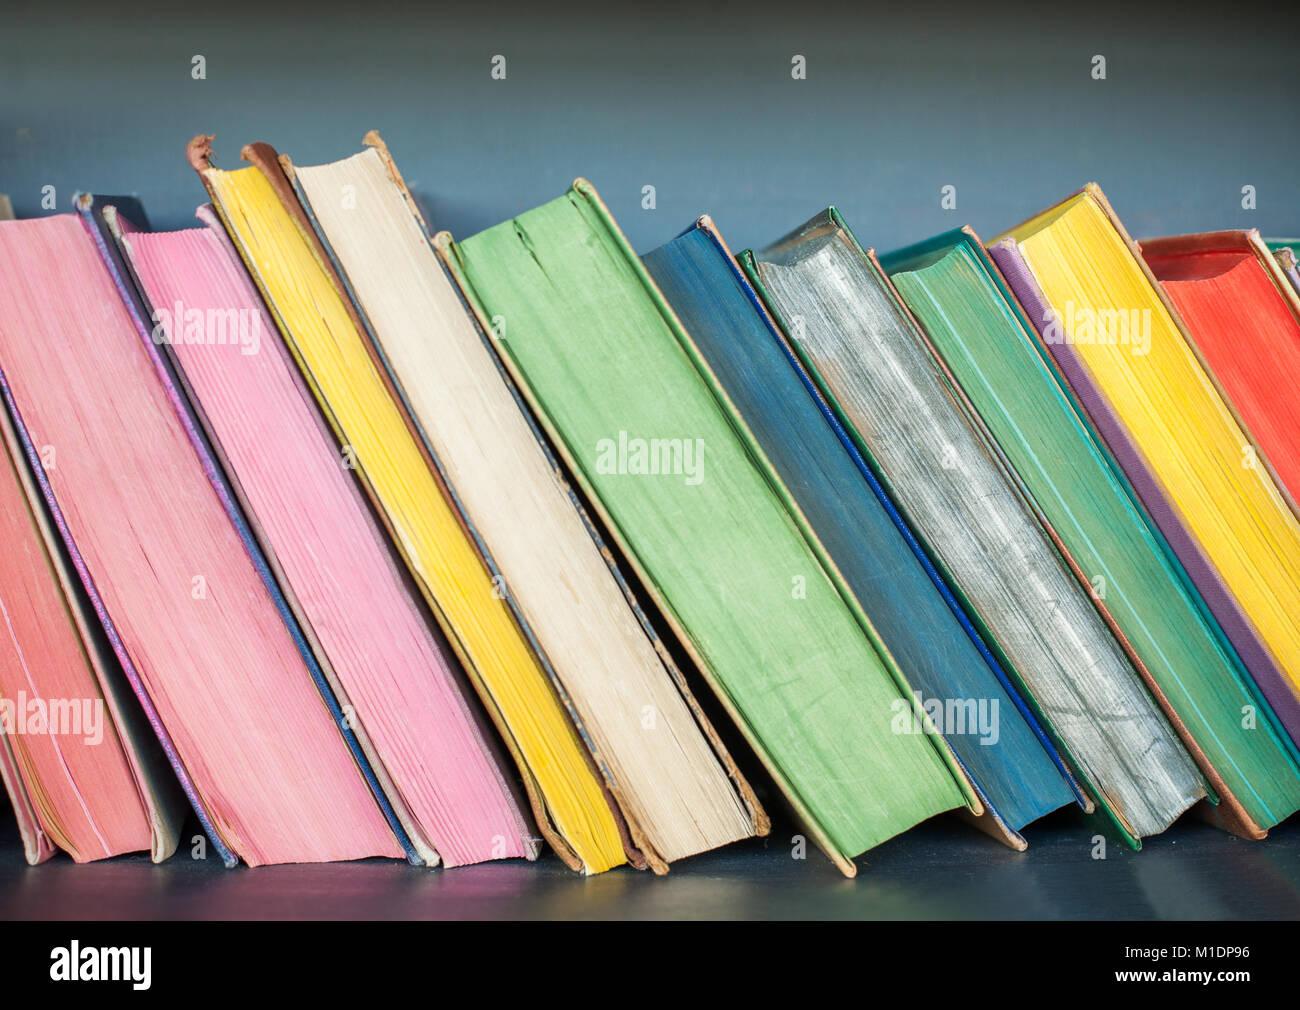 Colorful Books on the Shelf, Background. Bookshelves Stock Photo ...